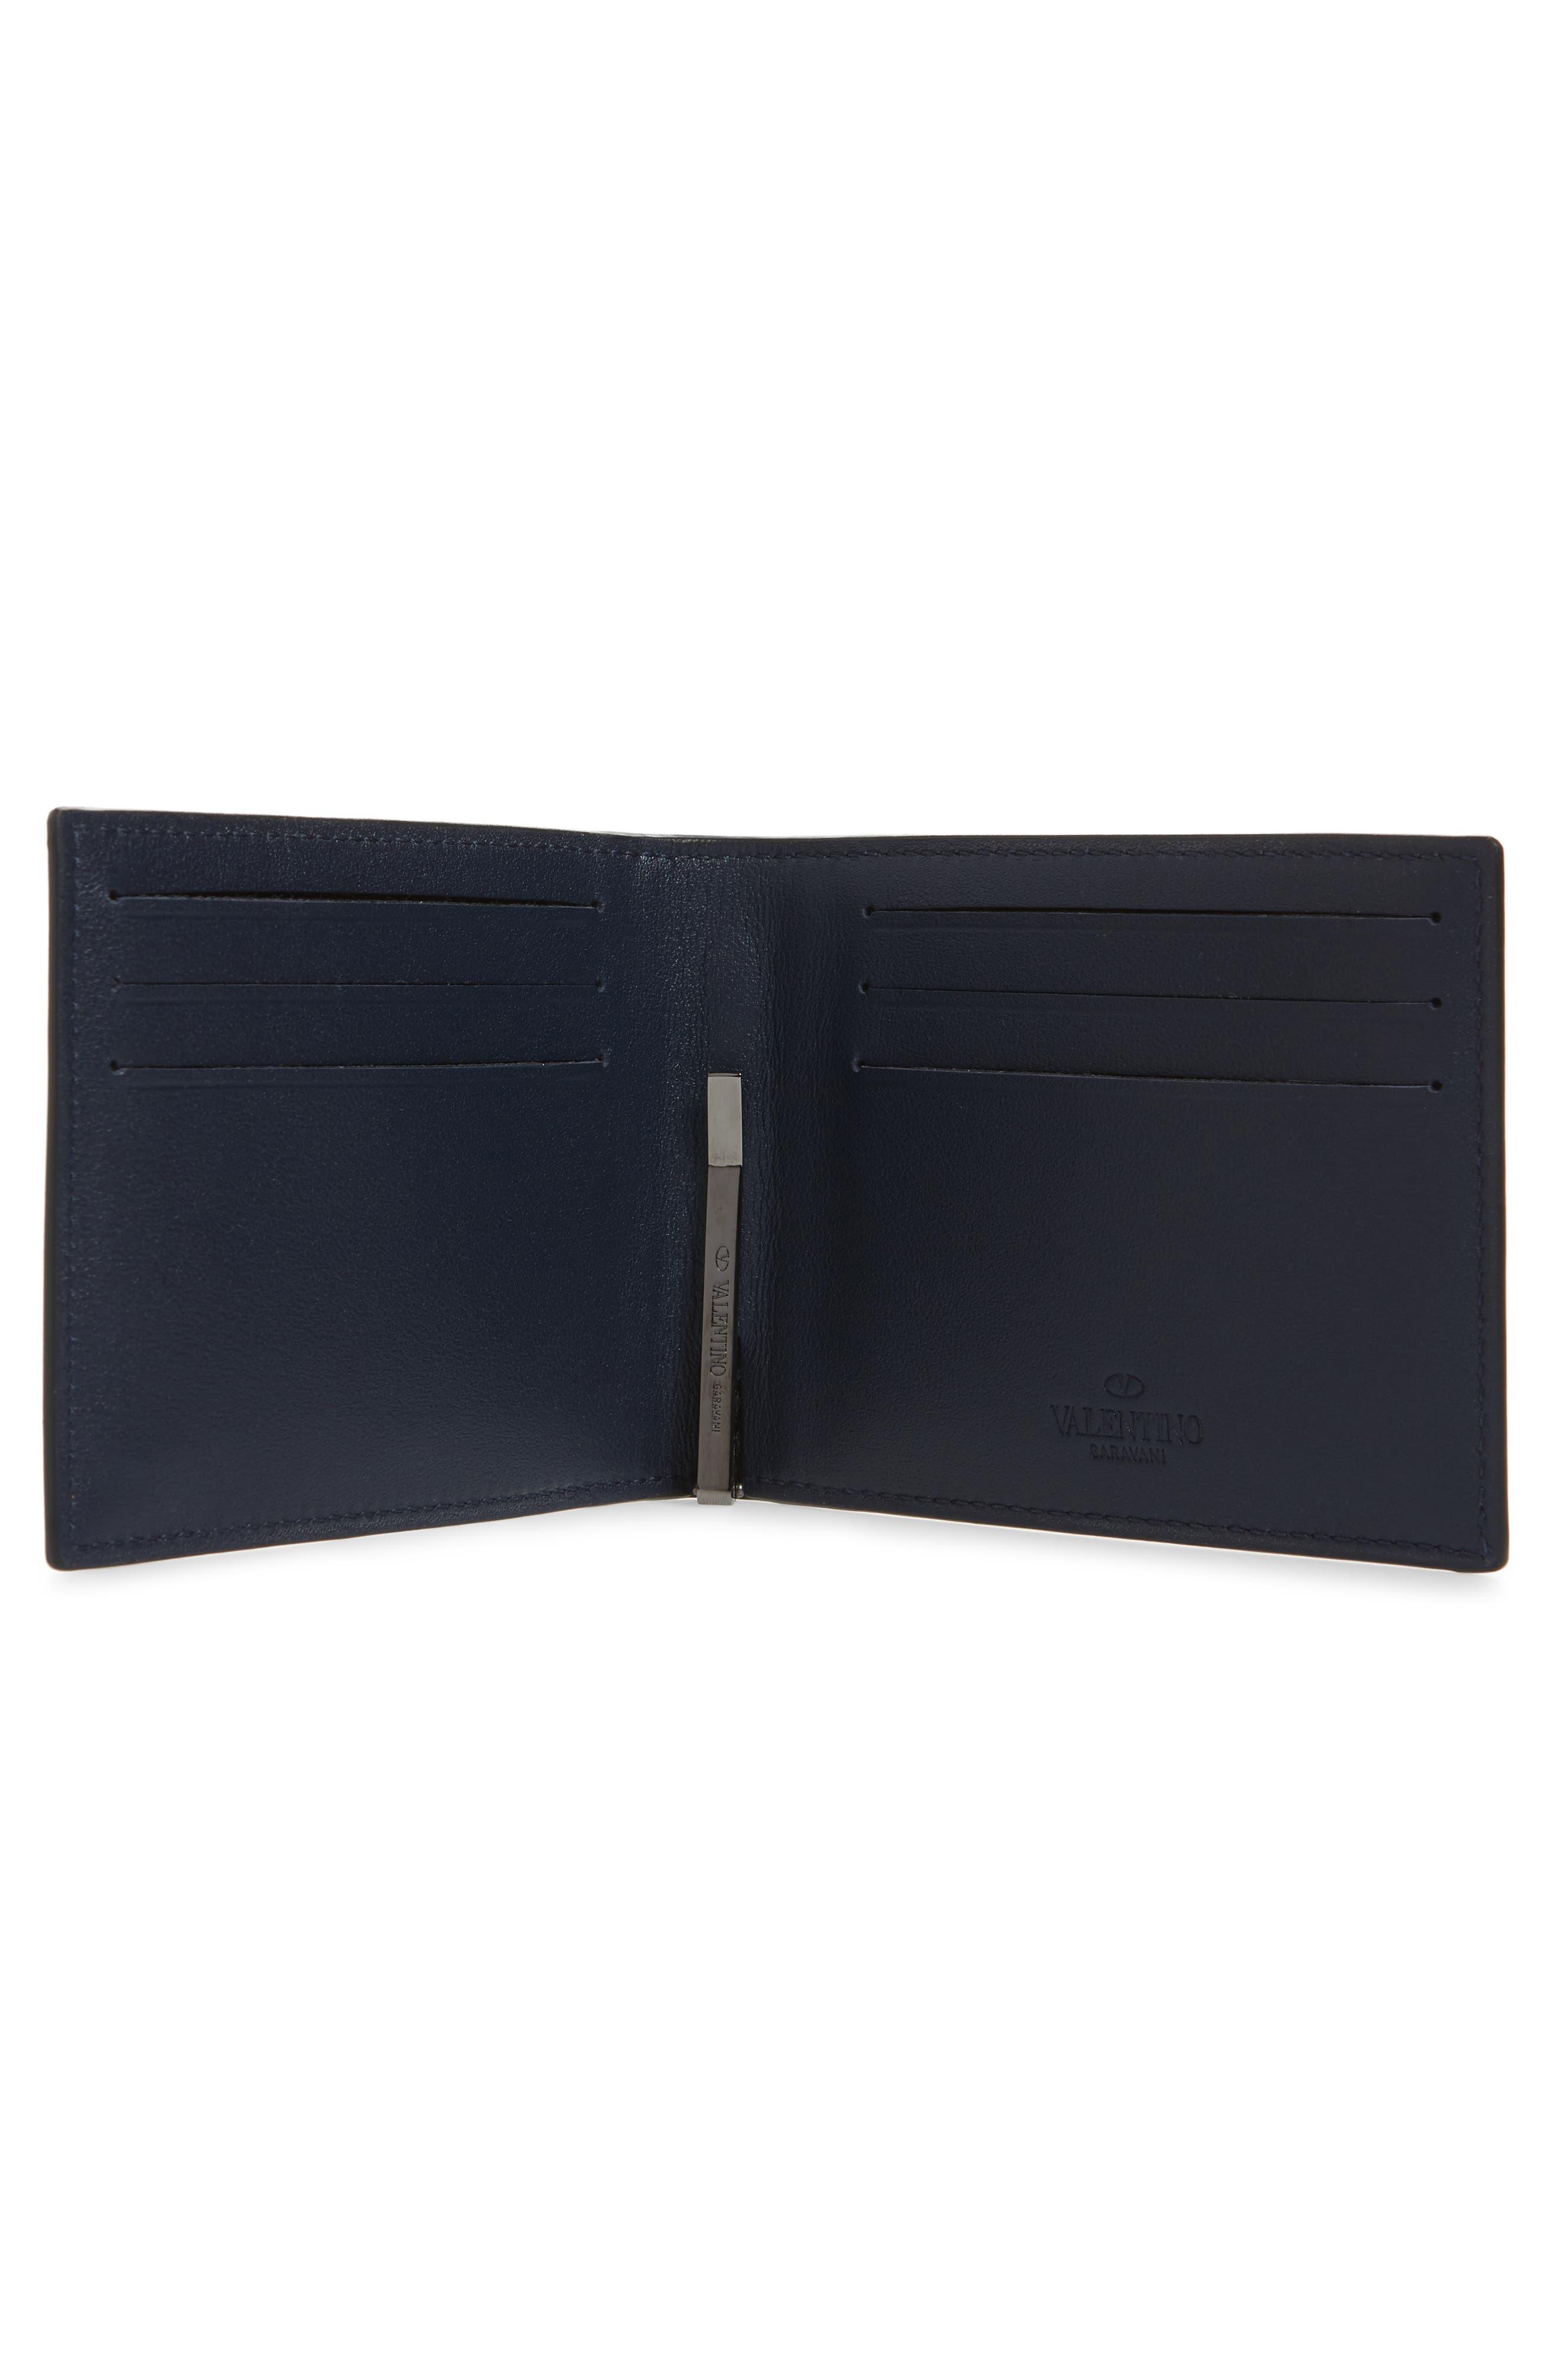 GARAVANI Stud Leather Money Clip Card Case,                             Alternate thumbnail 2, color,                             MARINE